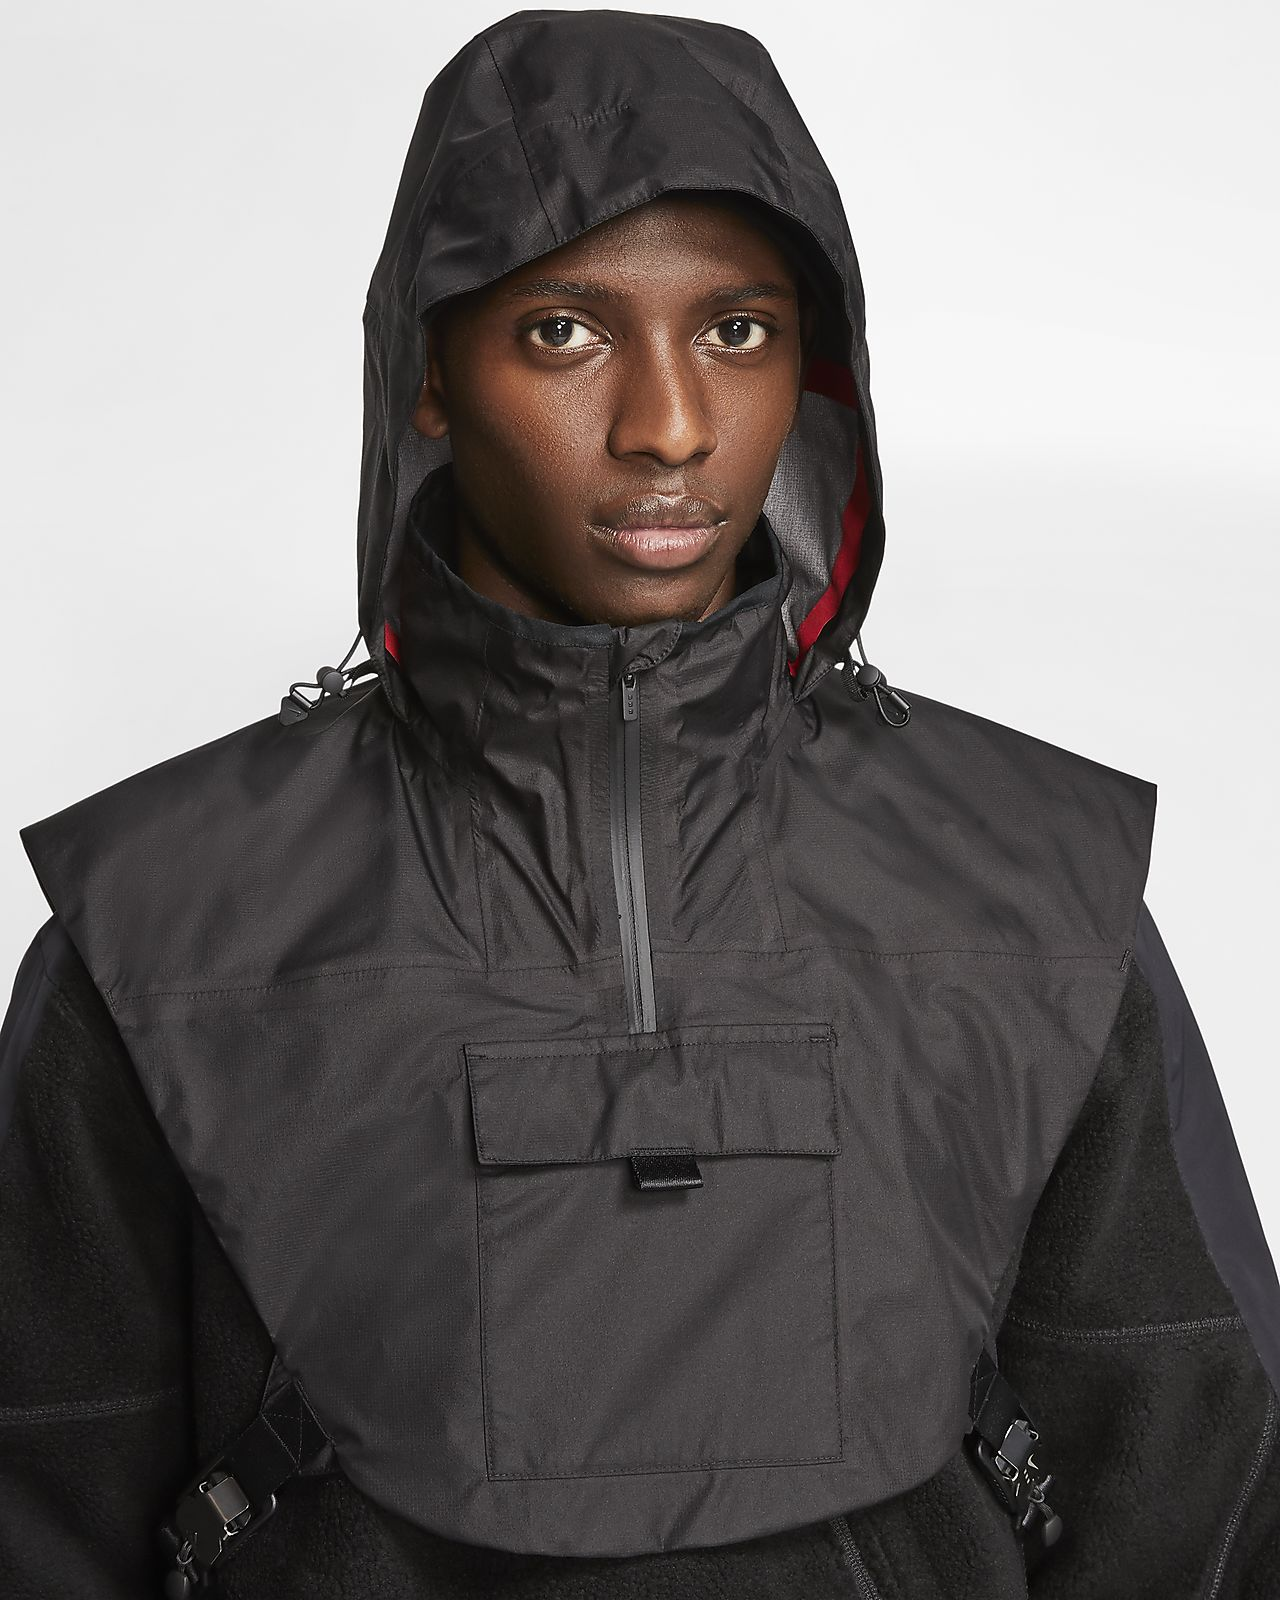 Nike x MMW Sherpa Jacket